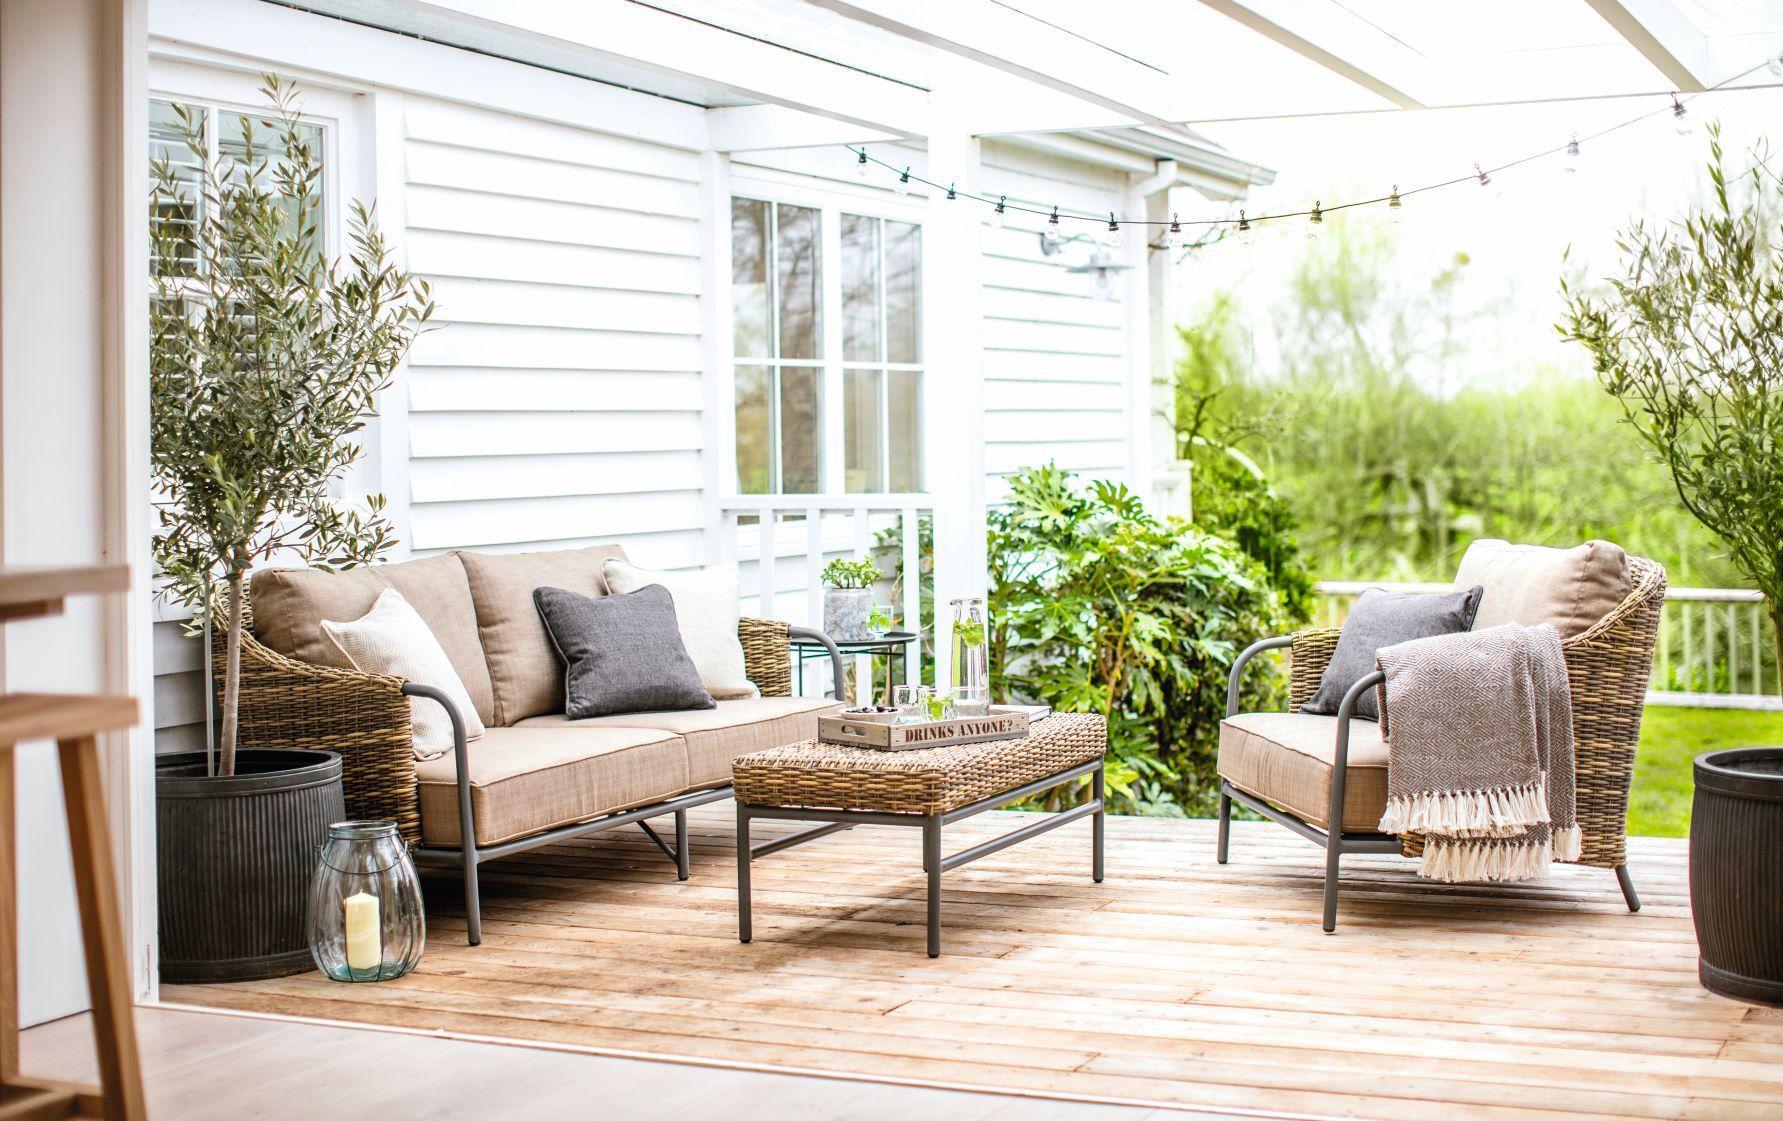 The Heyshott sofa set from Garden Trading